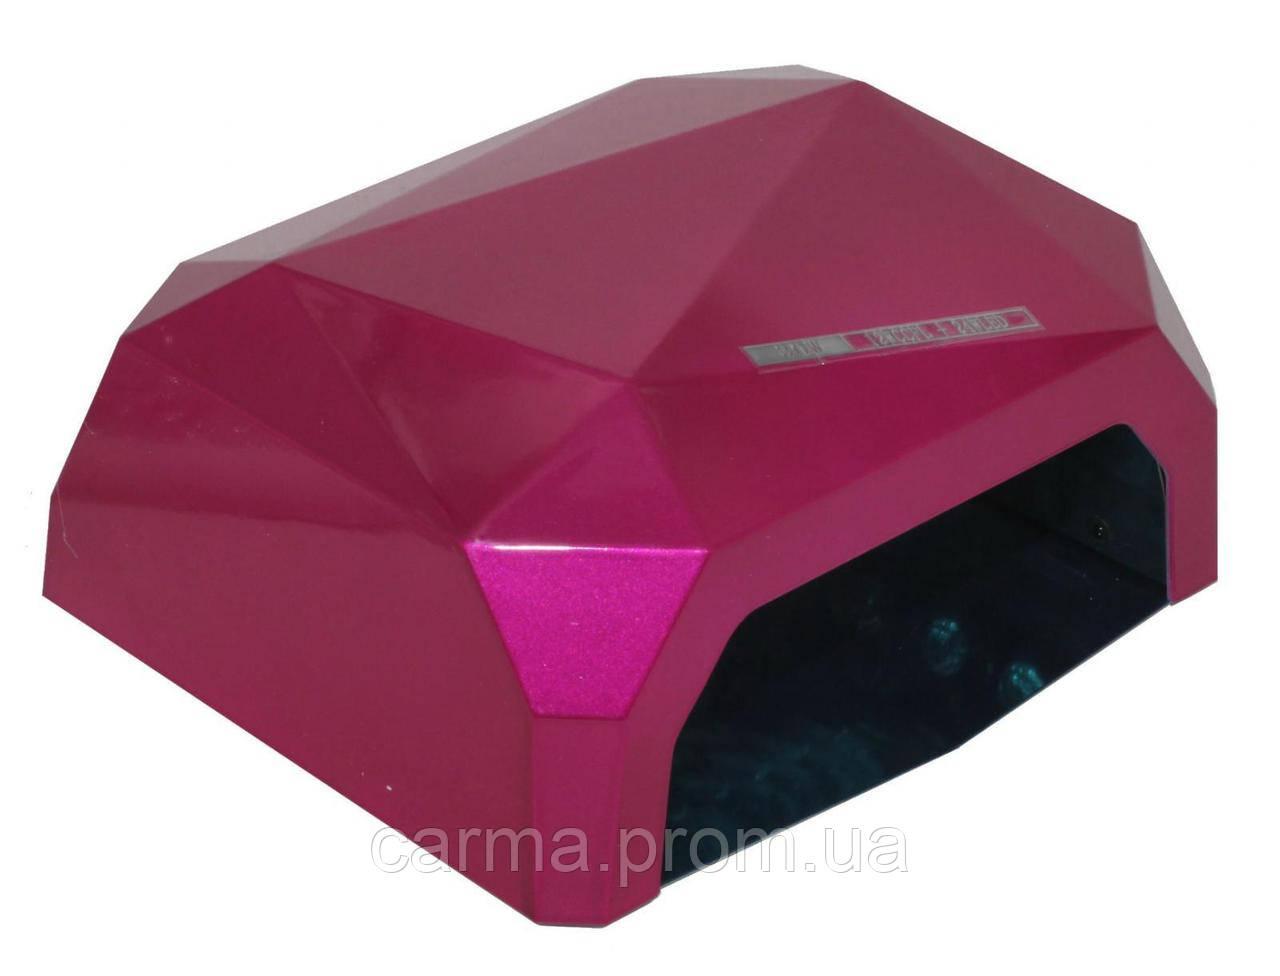 Лампа для маникюра гибридная DIAMOND CCFL+LED 36W Малиновая